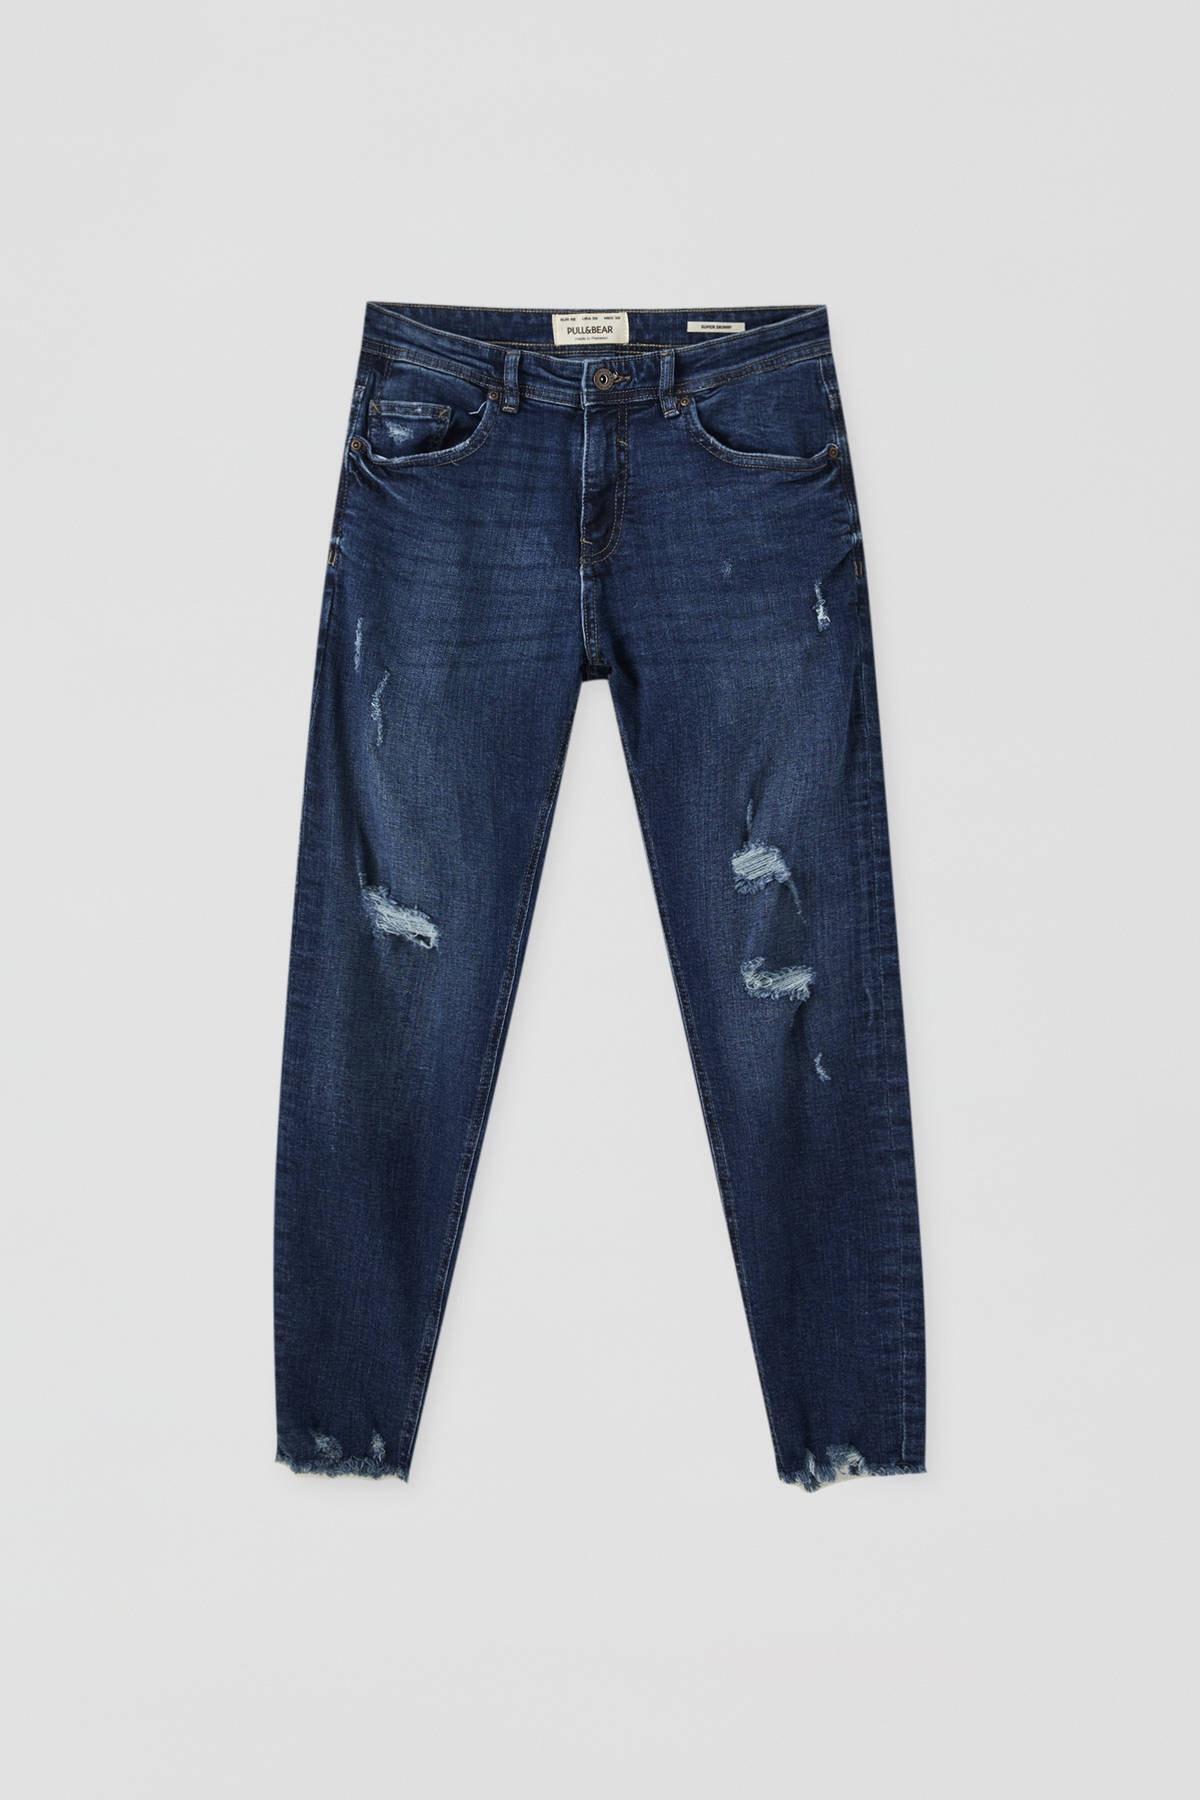 Pull & Bear Erkek Koyu Mavi Distressed Detaylı Basic Super Skinny Fit Jean 09683500